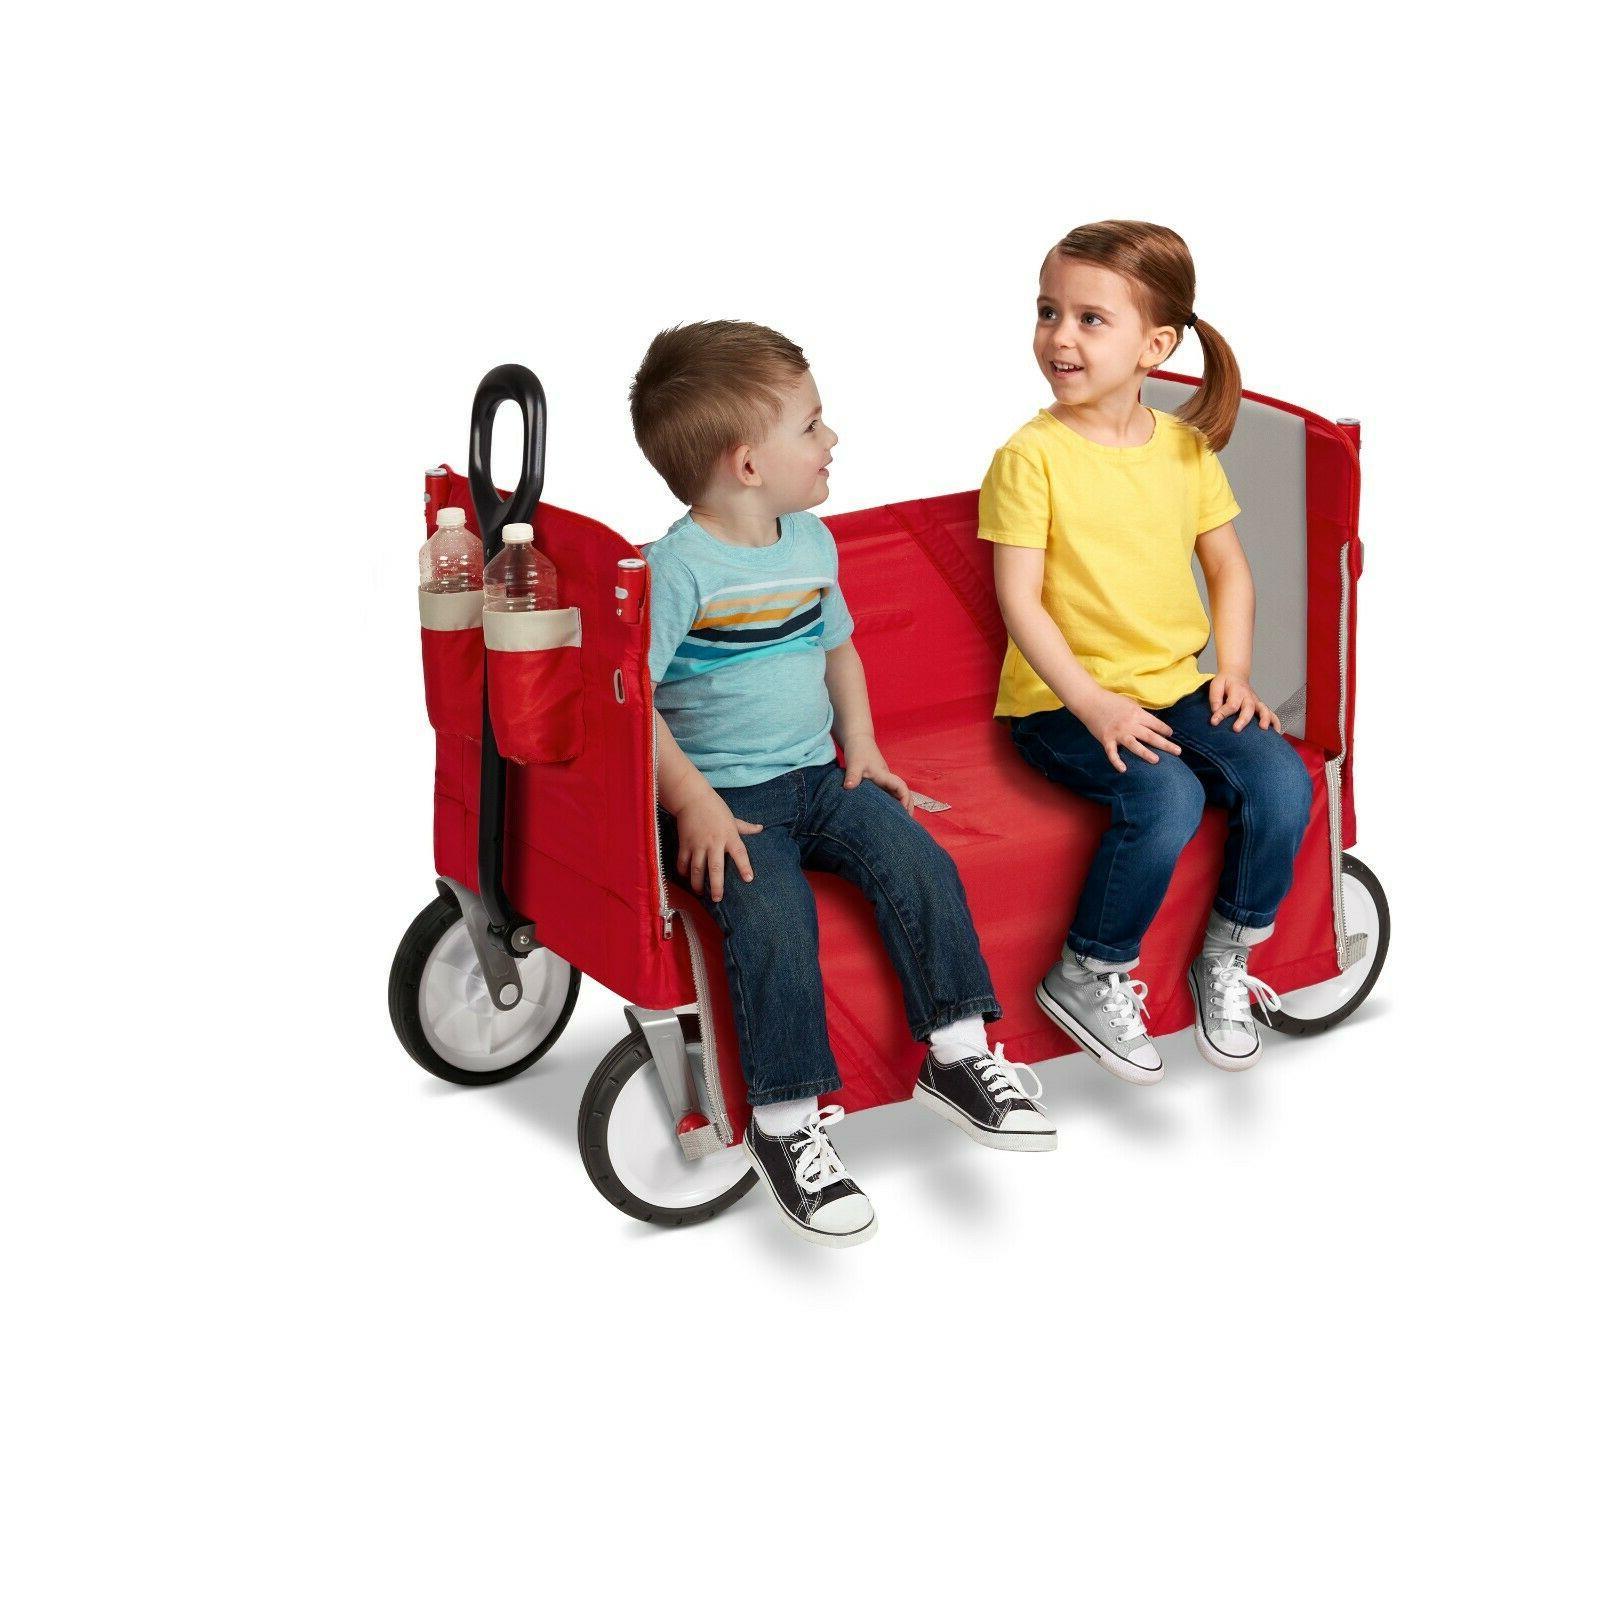 Radio Flyer, 3-in-1 Fold Ride-On Toys